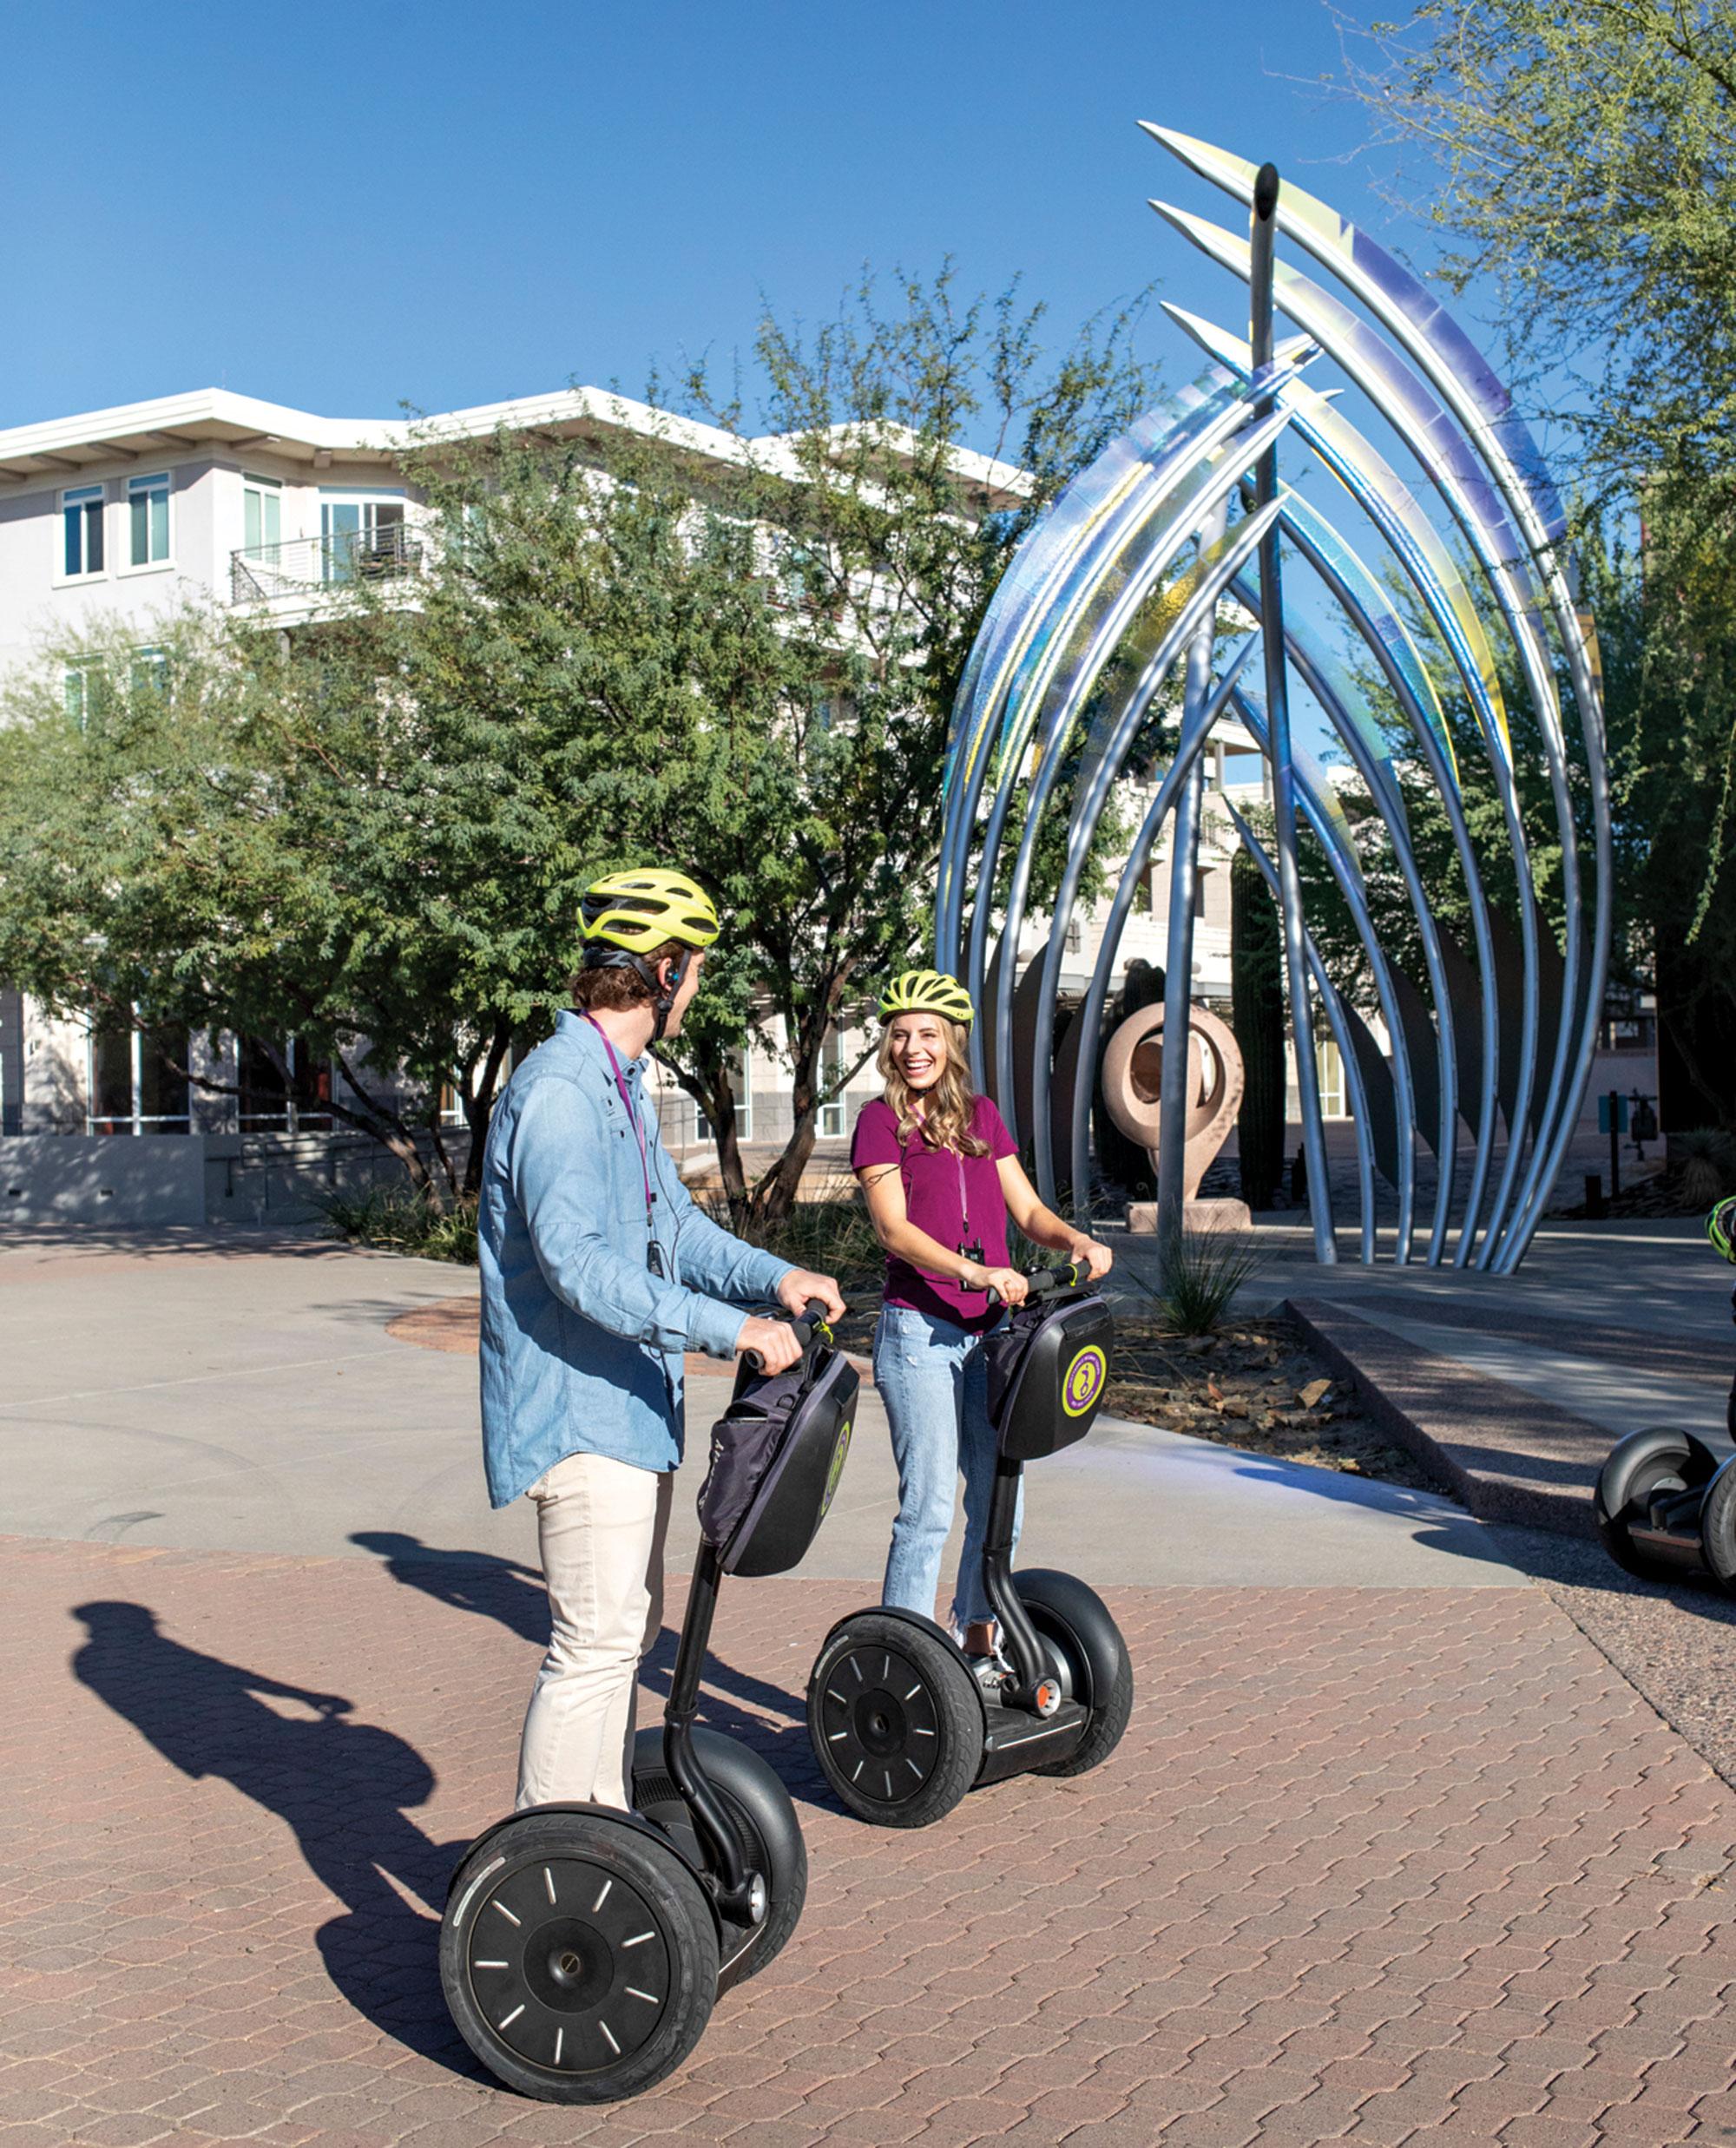 Scottsdale Segway Tours; Photo by Mark Lipczynski; models: Taylor McGlone & Kyle O'Malley/Ford Robert Black Agency